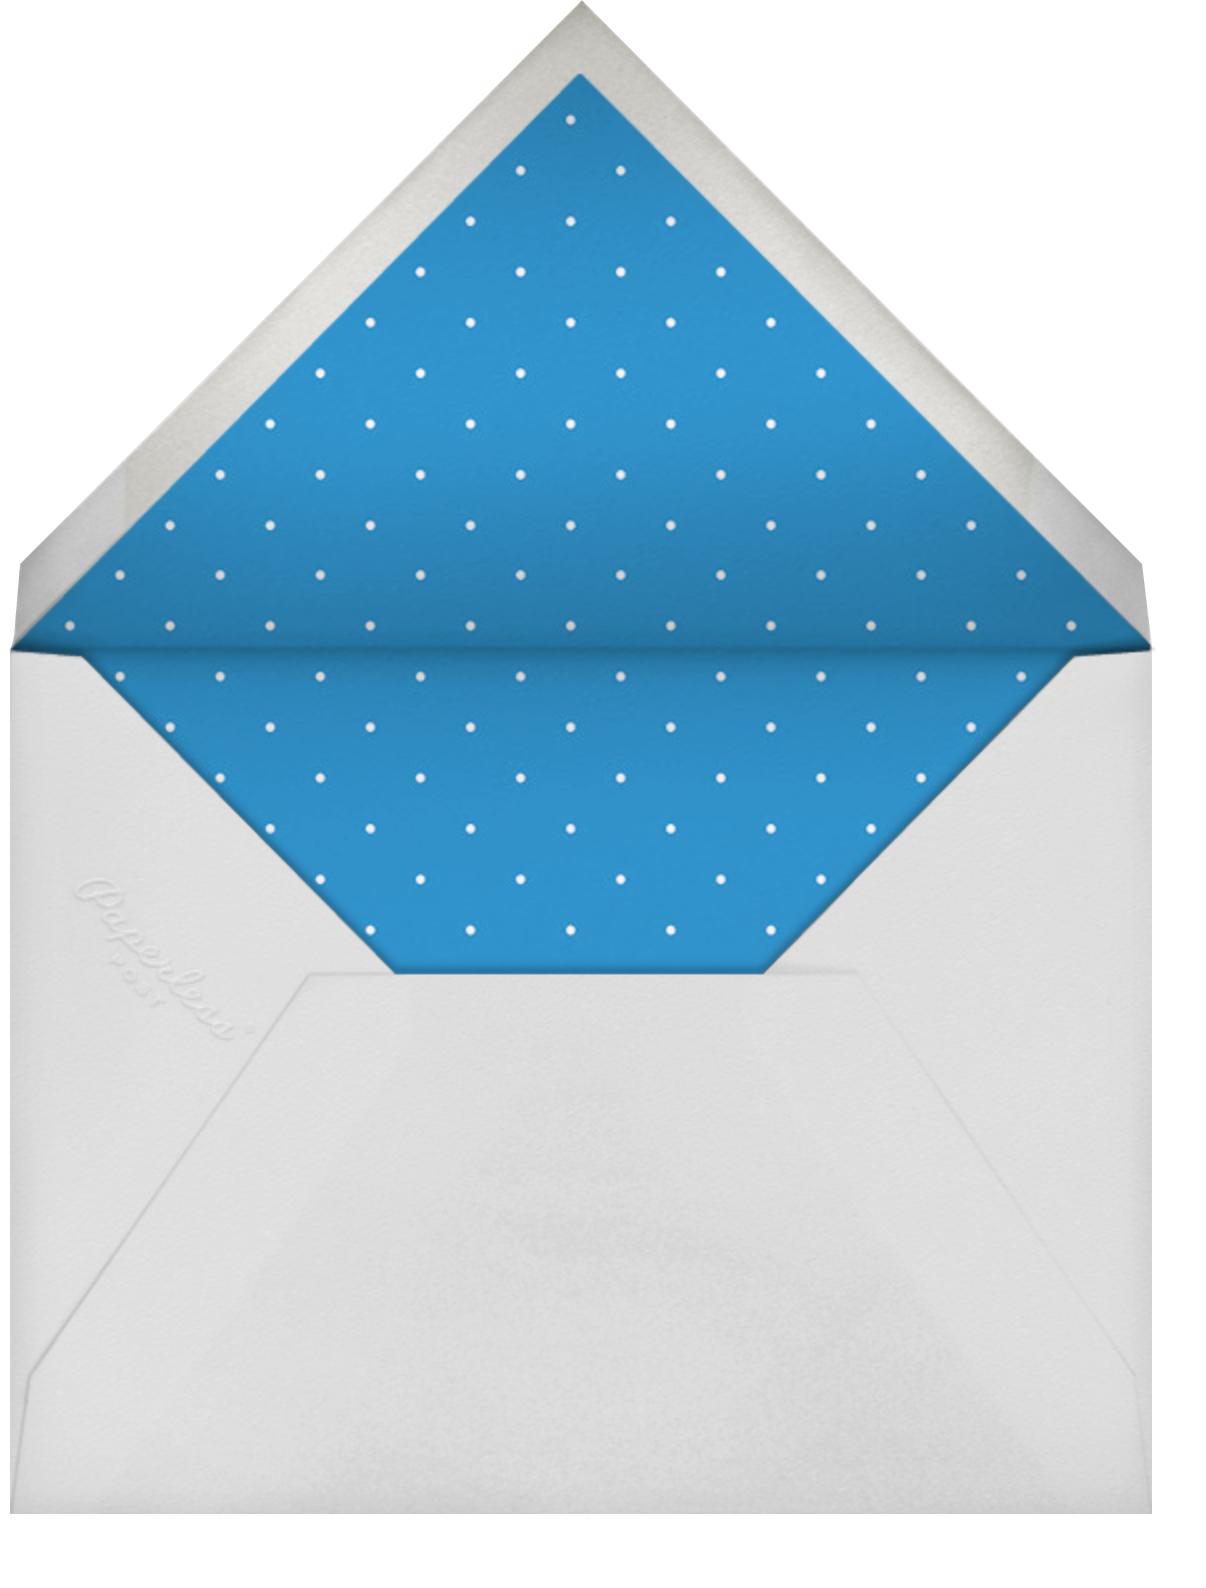 Baby Love - Blues - Mr. Boddington's Studio - Baby shower - envelope back